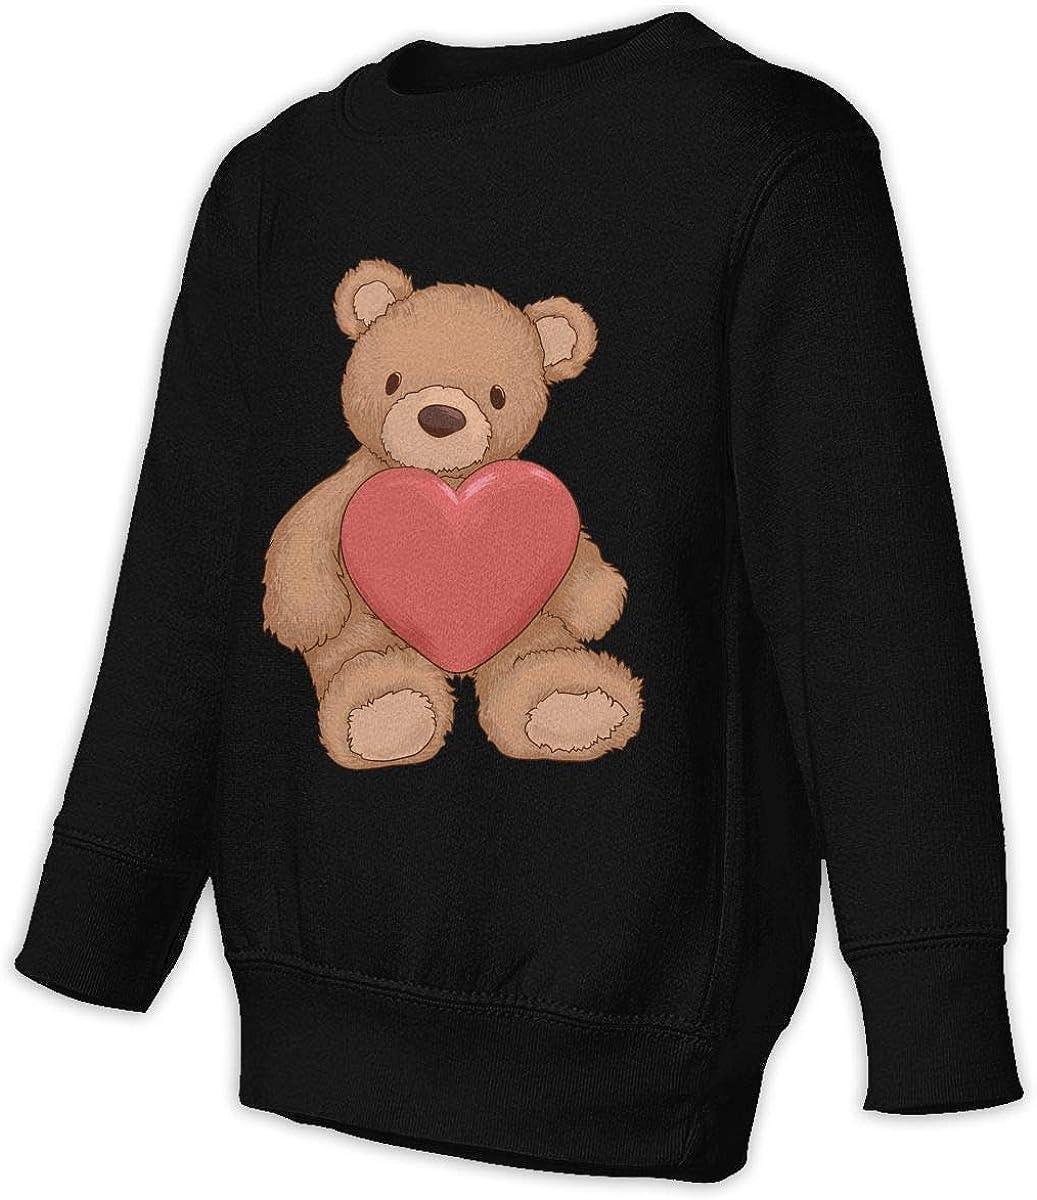 Fleece Pull Over Sweatshirt for Boys Girls Kids Youth Cartoon Cute Bear Unisex Toddler Hoodies